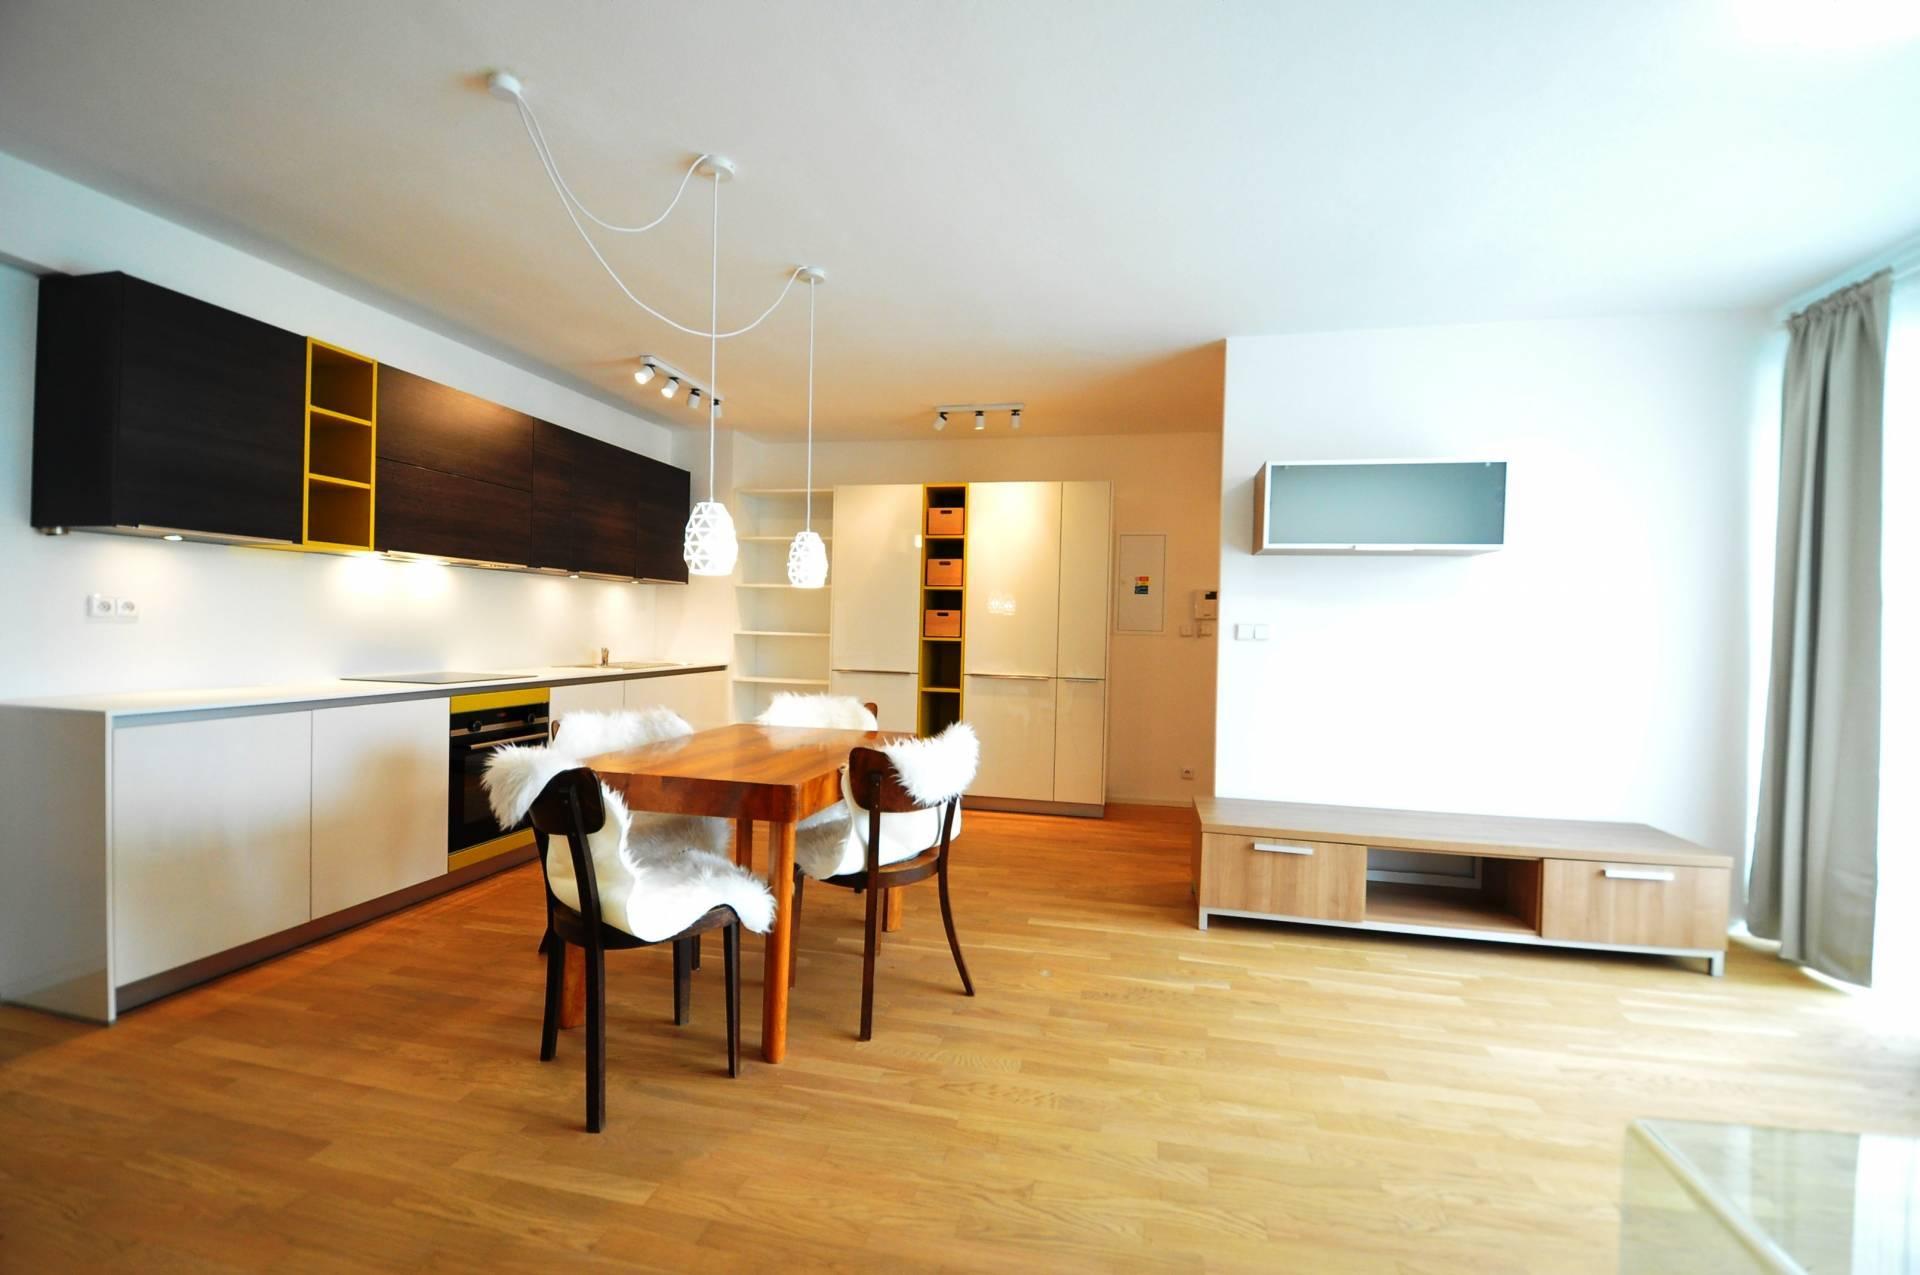 PRENÁJOM, 3-izbový byt + Garáž, Poprad, Ul. Podtatranská, Polyfunkčný dom Javor,